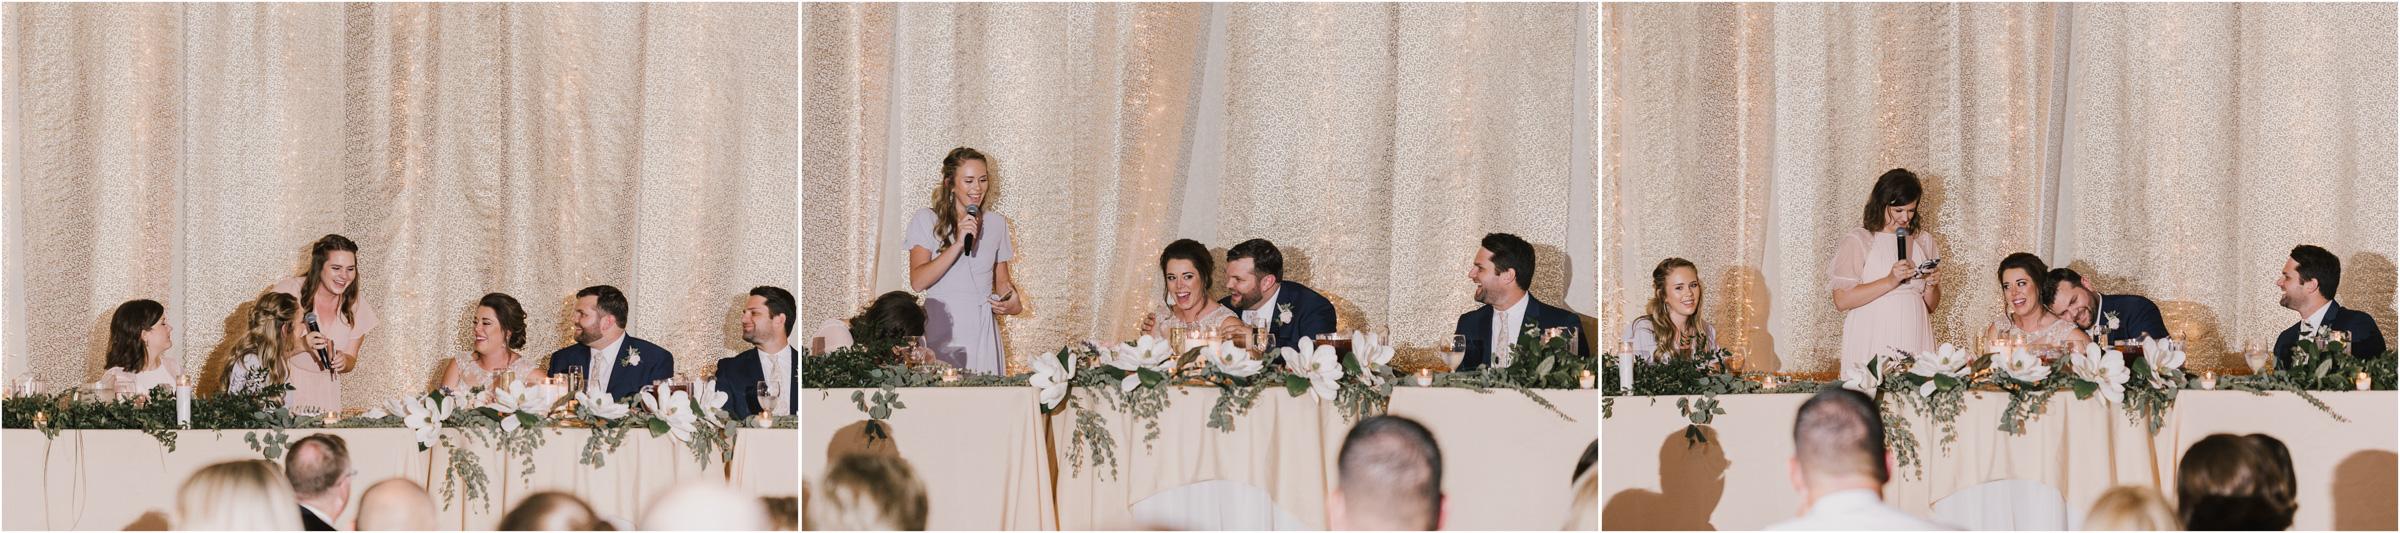 alyssa barletter photography summer odessa missouri wedding kansas city photographer-73.jpg